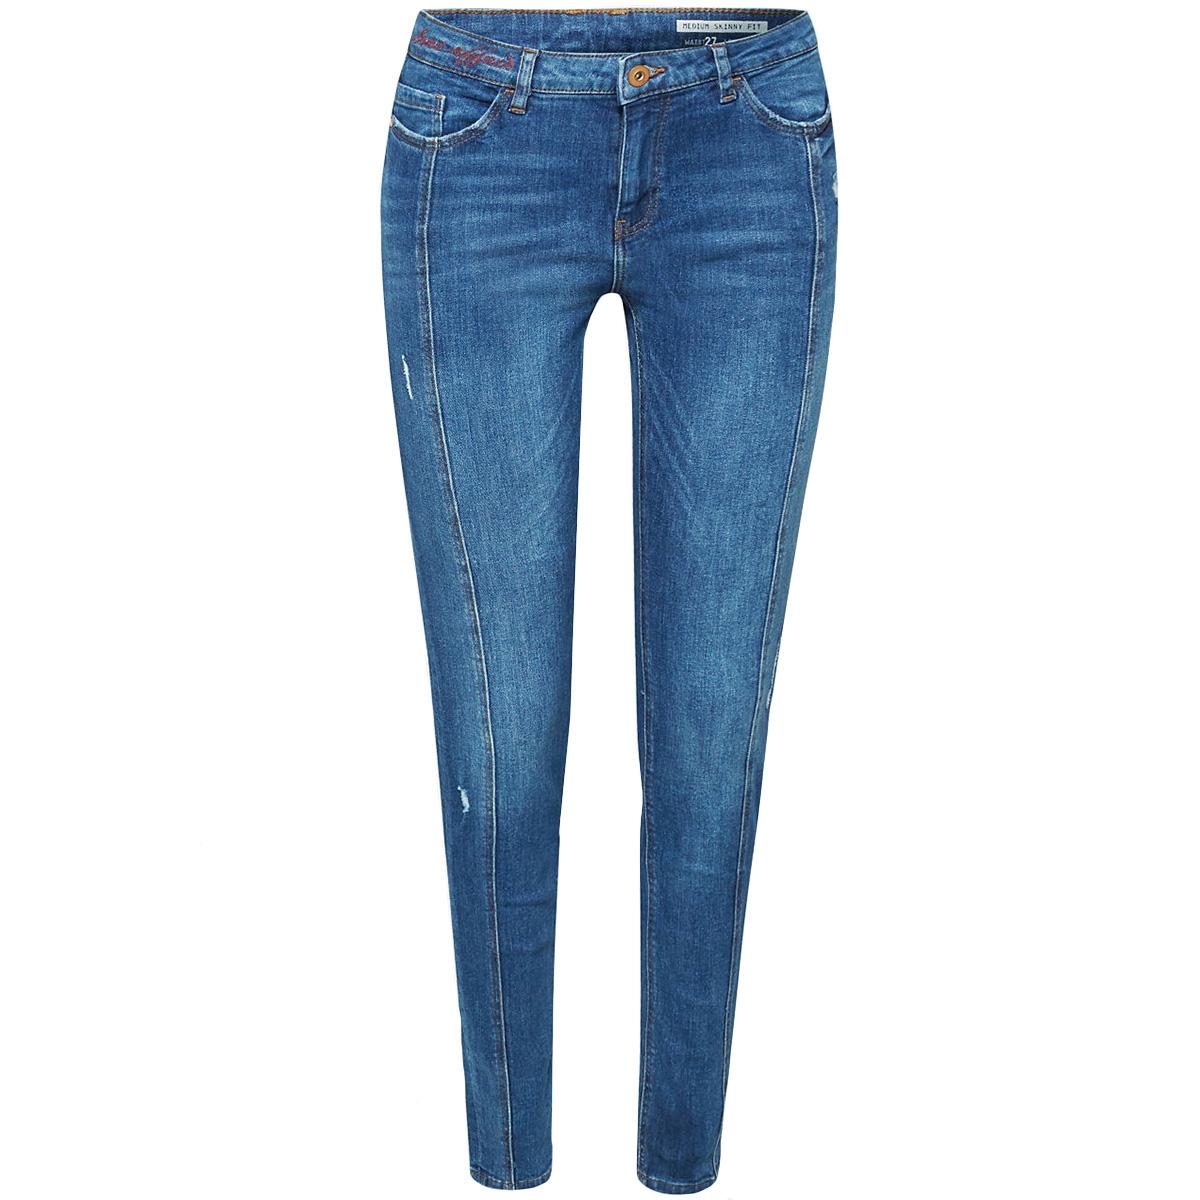 128cc1b006 edc jeans c902